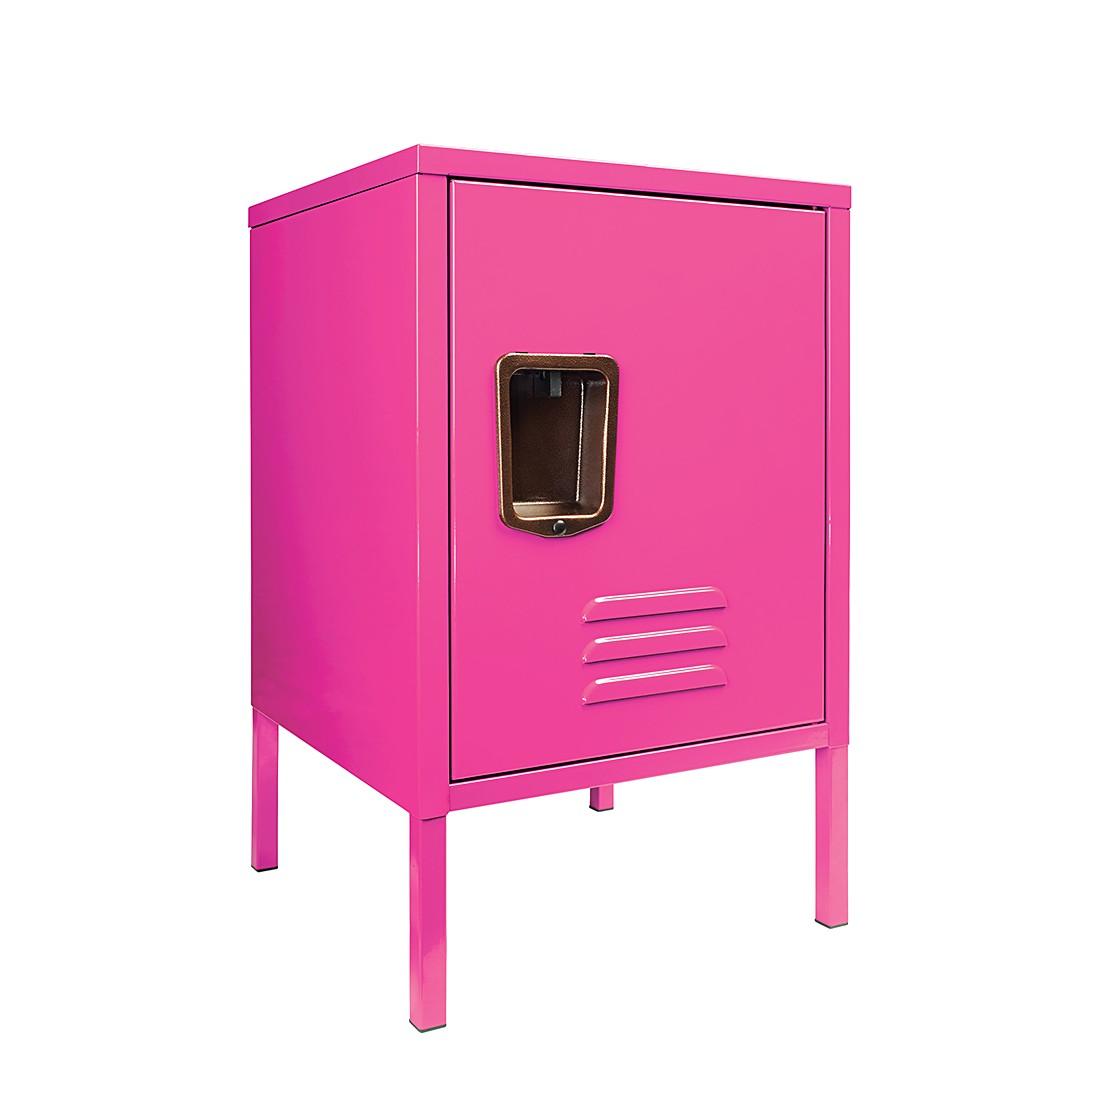 Metallschrank Funky Cube – Pink, MyFunky günstig bestellen